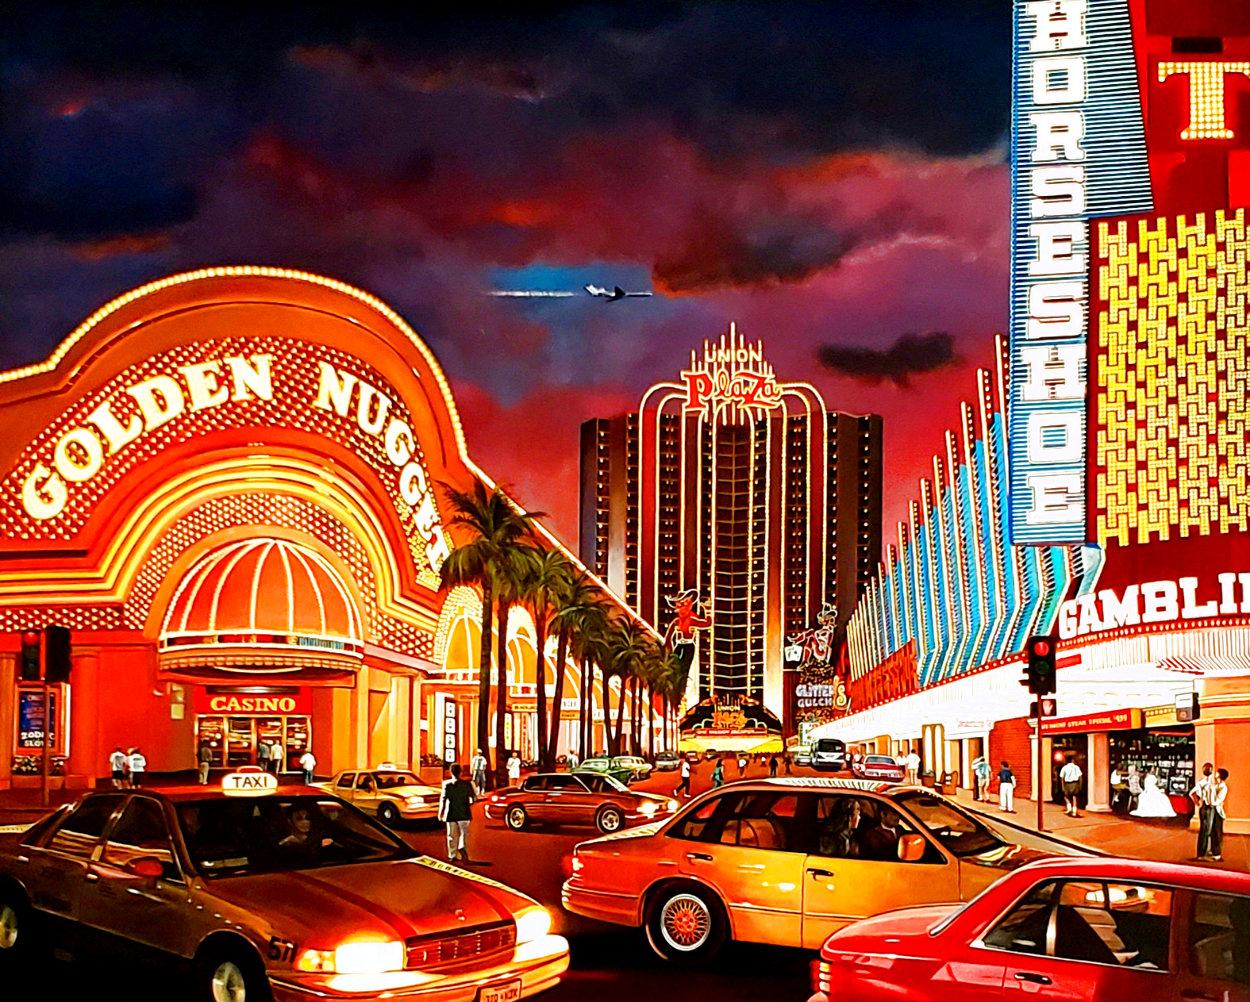 Untitled Las Vegas Cityscape 1995 50x62 Super Huge Original Painting by Ken Keeley